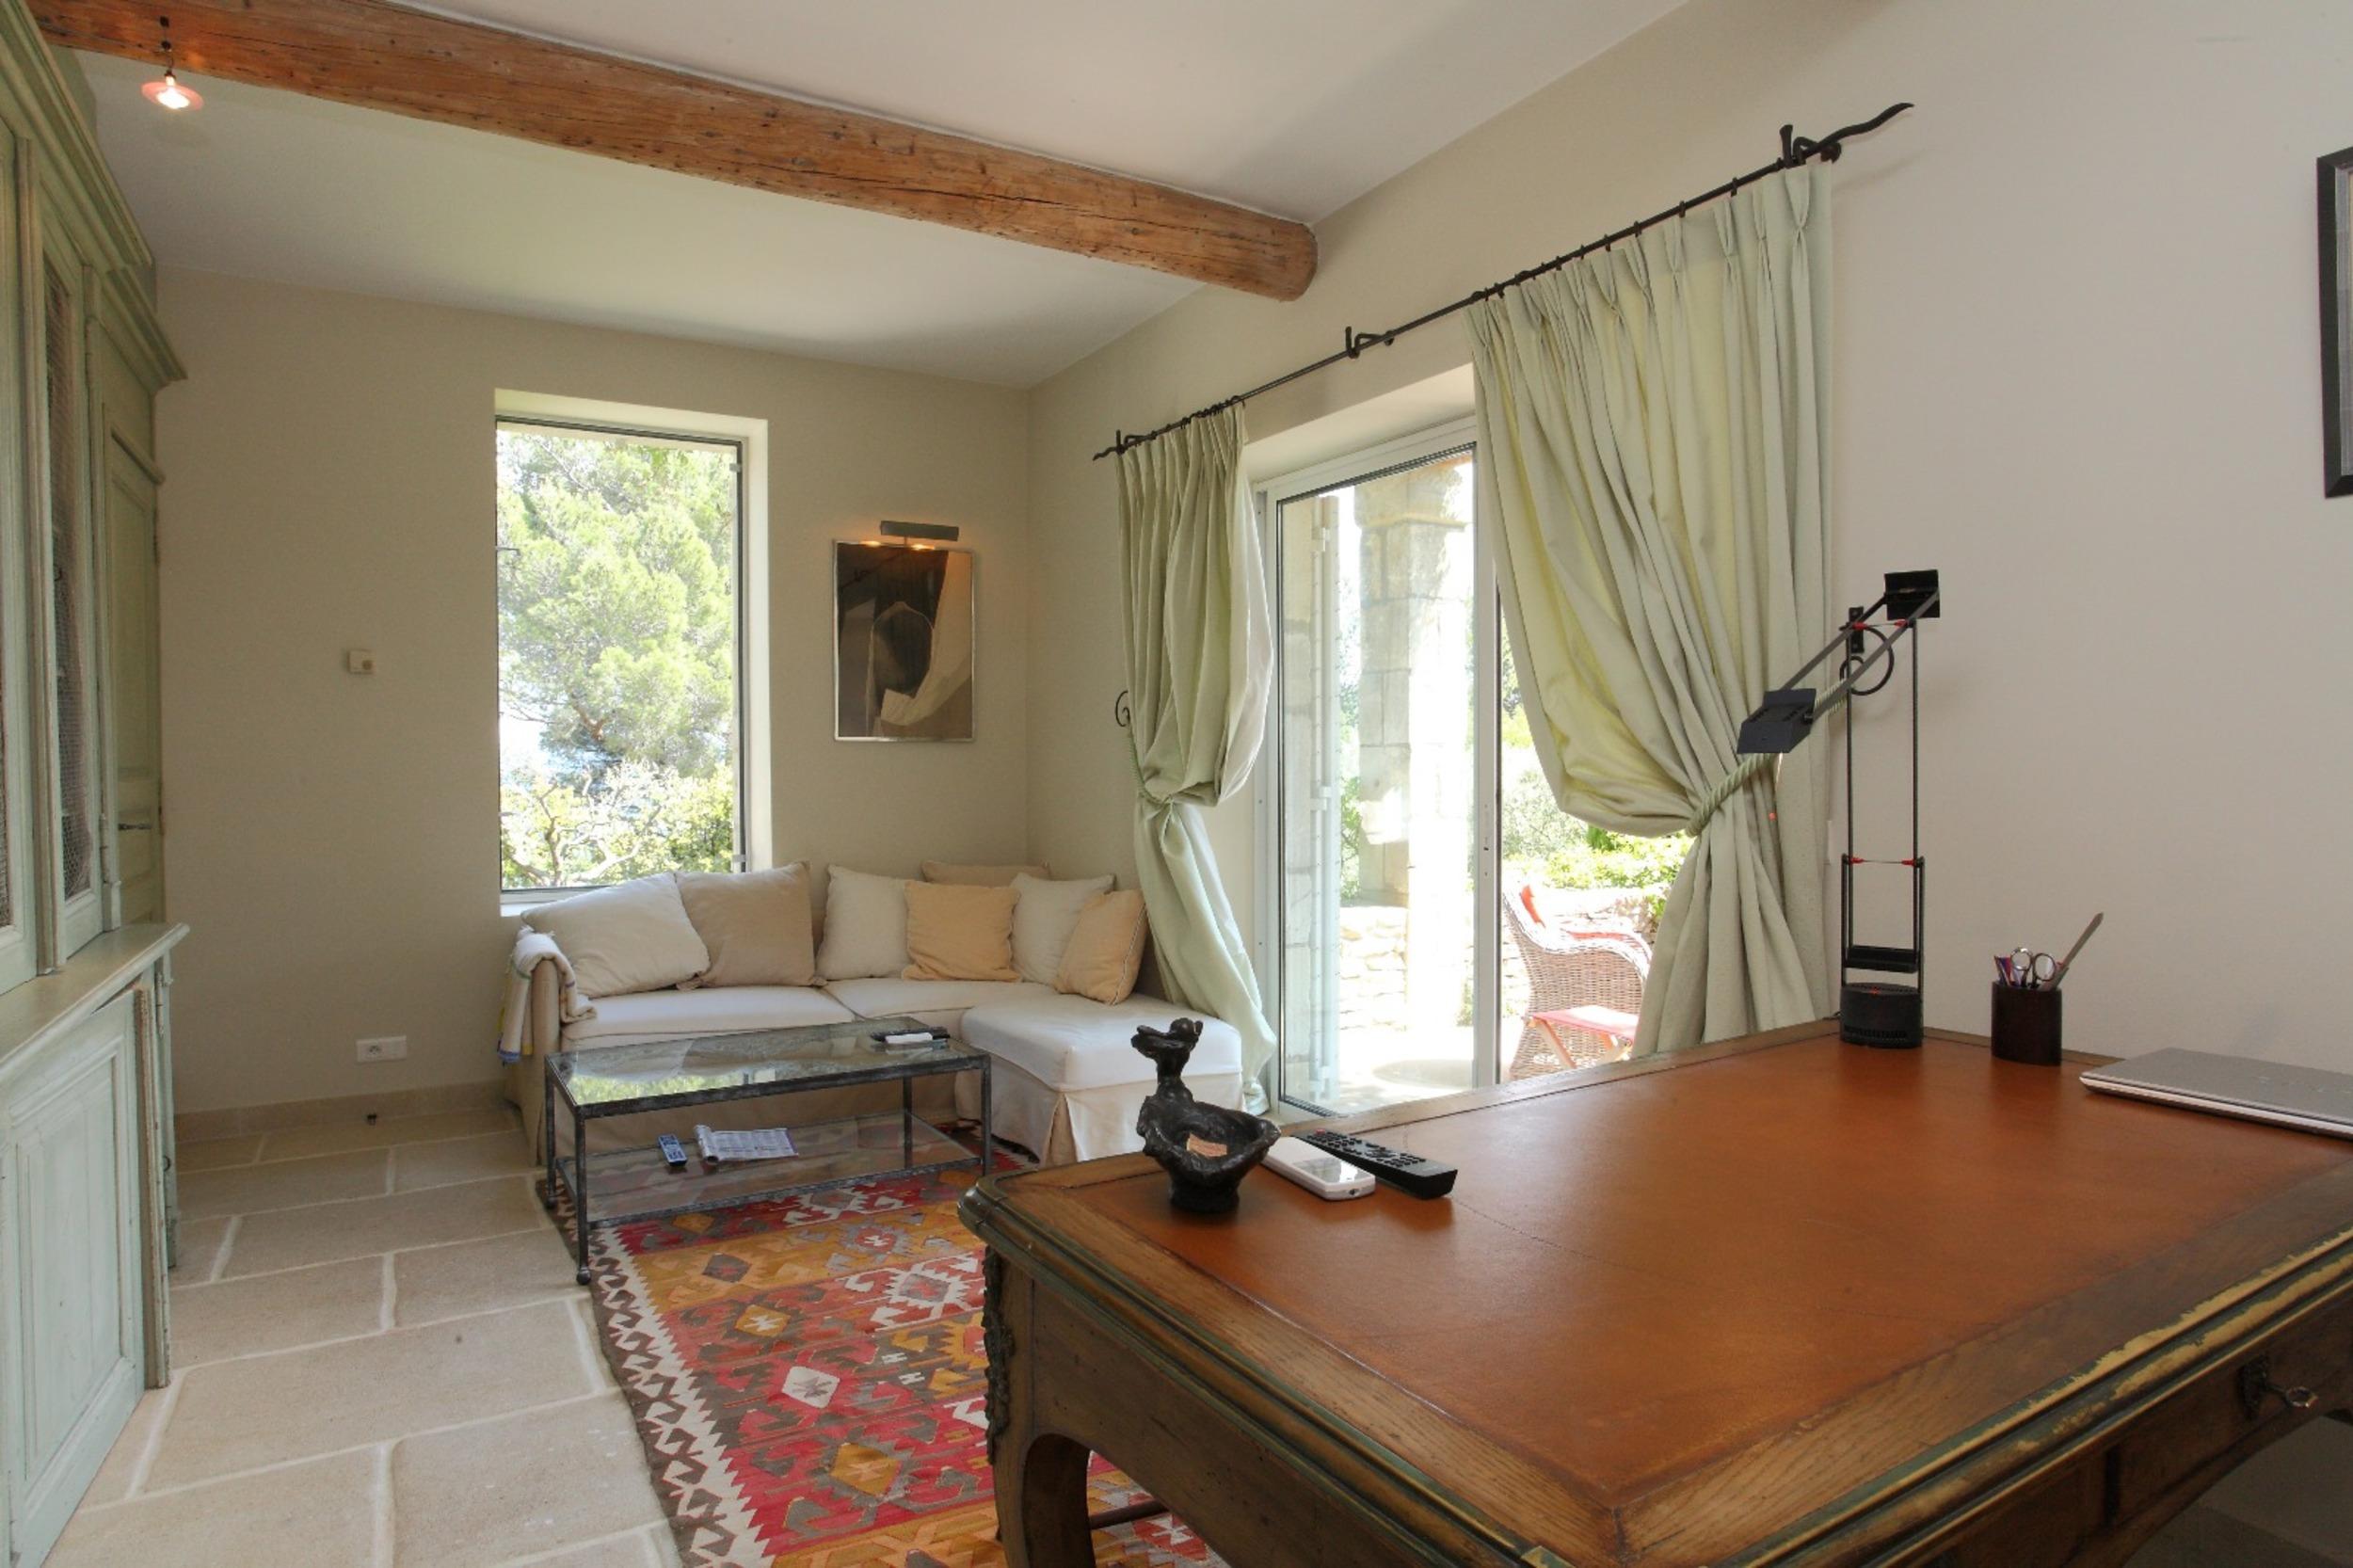 Holiday house Der Fall - Fabelhaftes Landhaus in Gordes (2520443), Gordes, Vaucluse, Provence - Alps - Côte d'Azur, France, picture 12